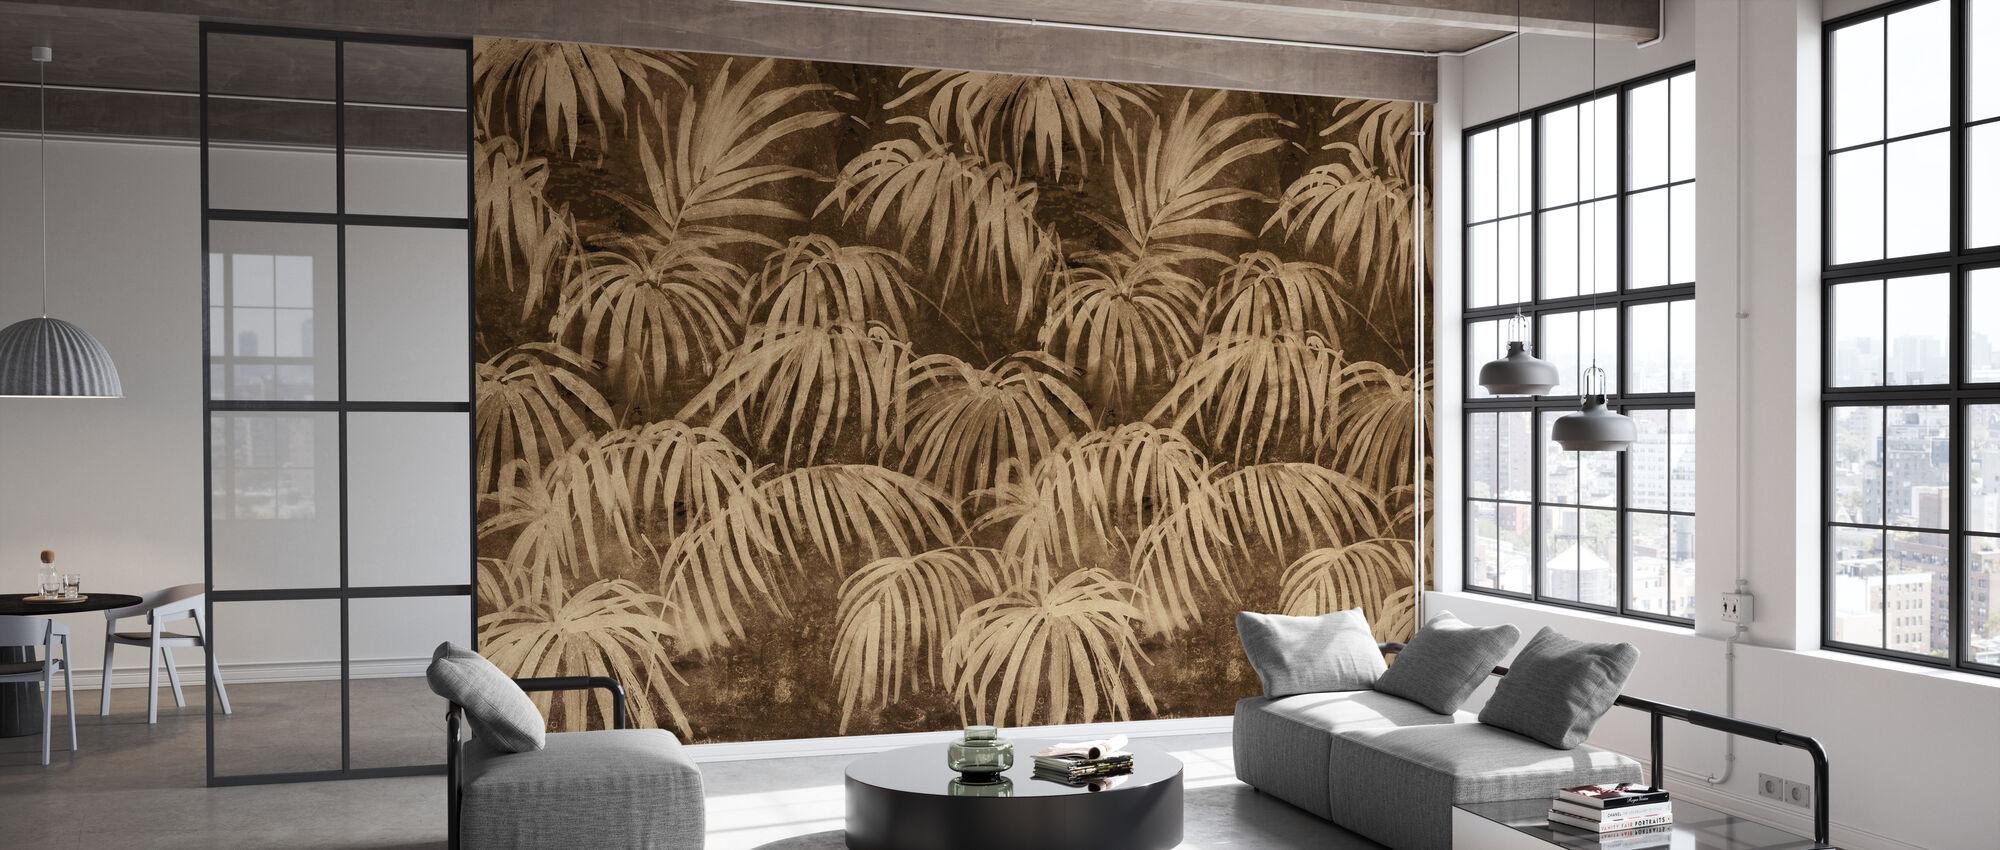 Bohemian Bamboo - Wallpaper - Office